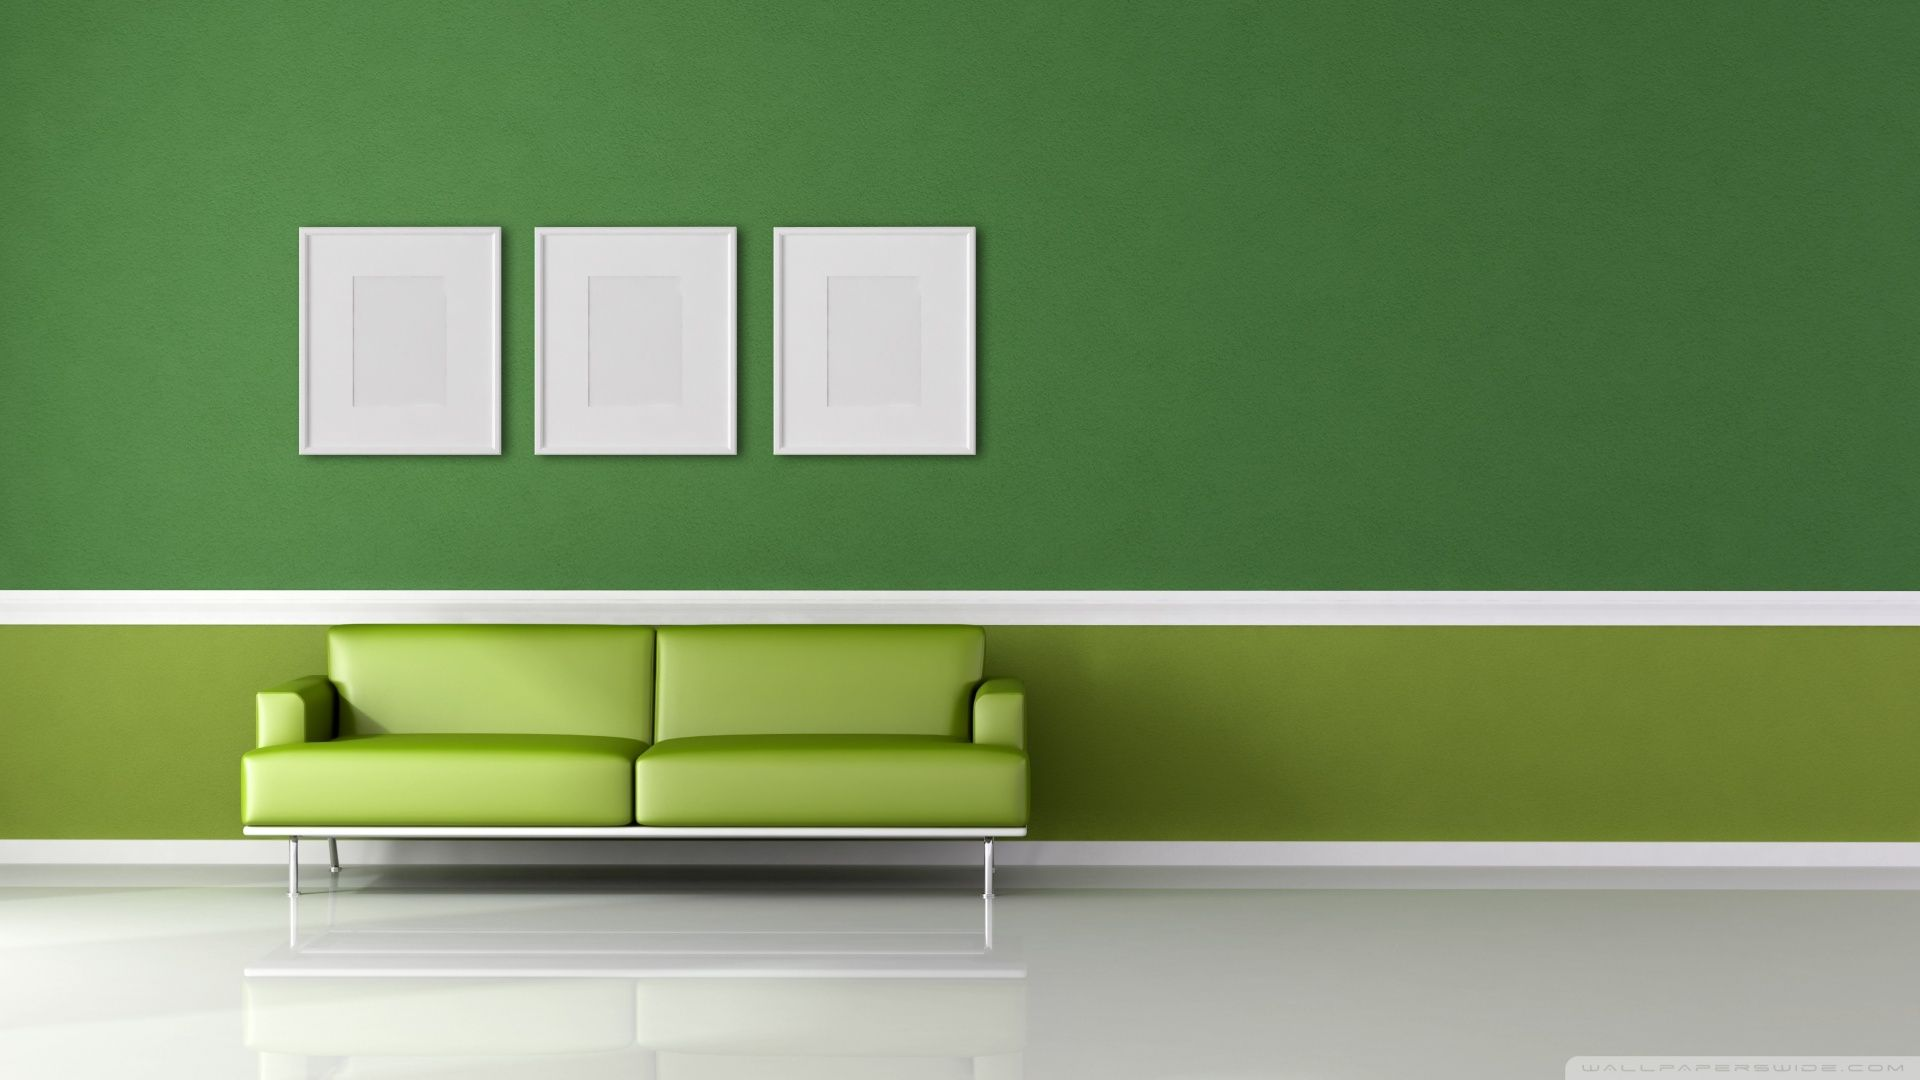 Furniture vertical wallpaper hd